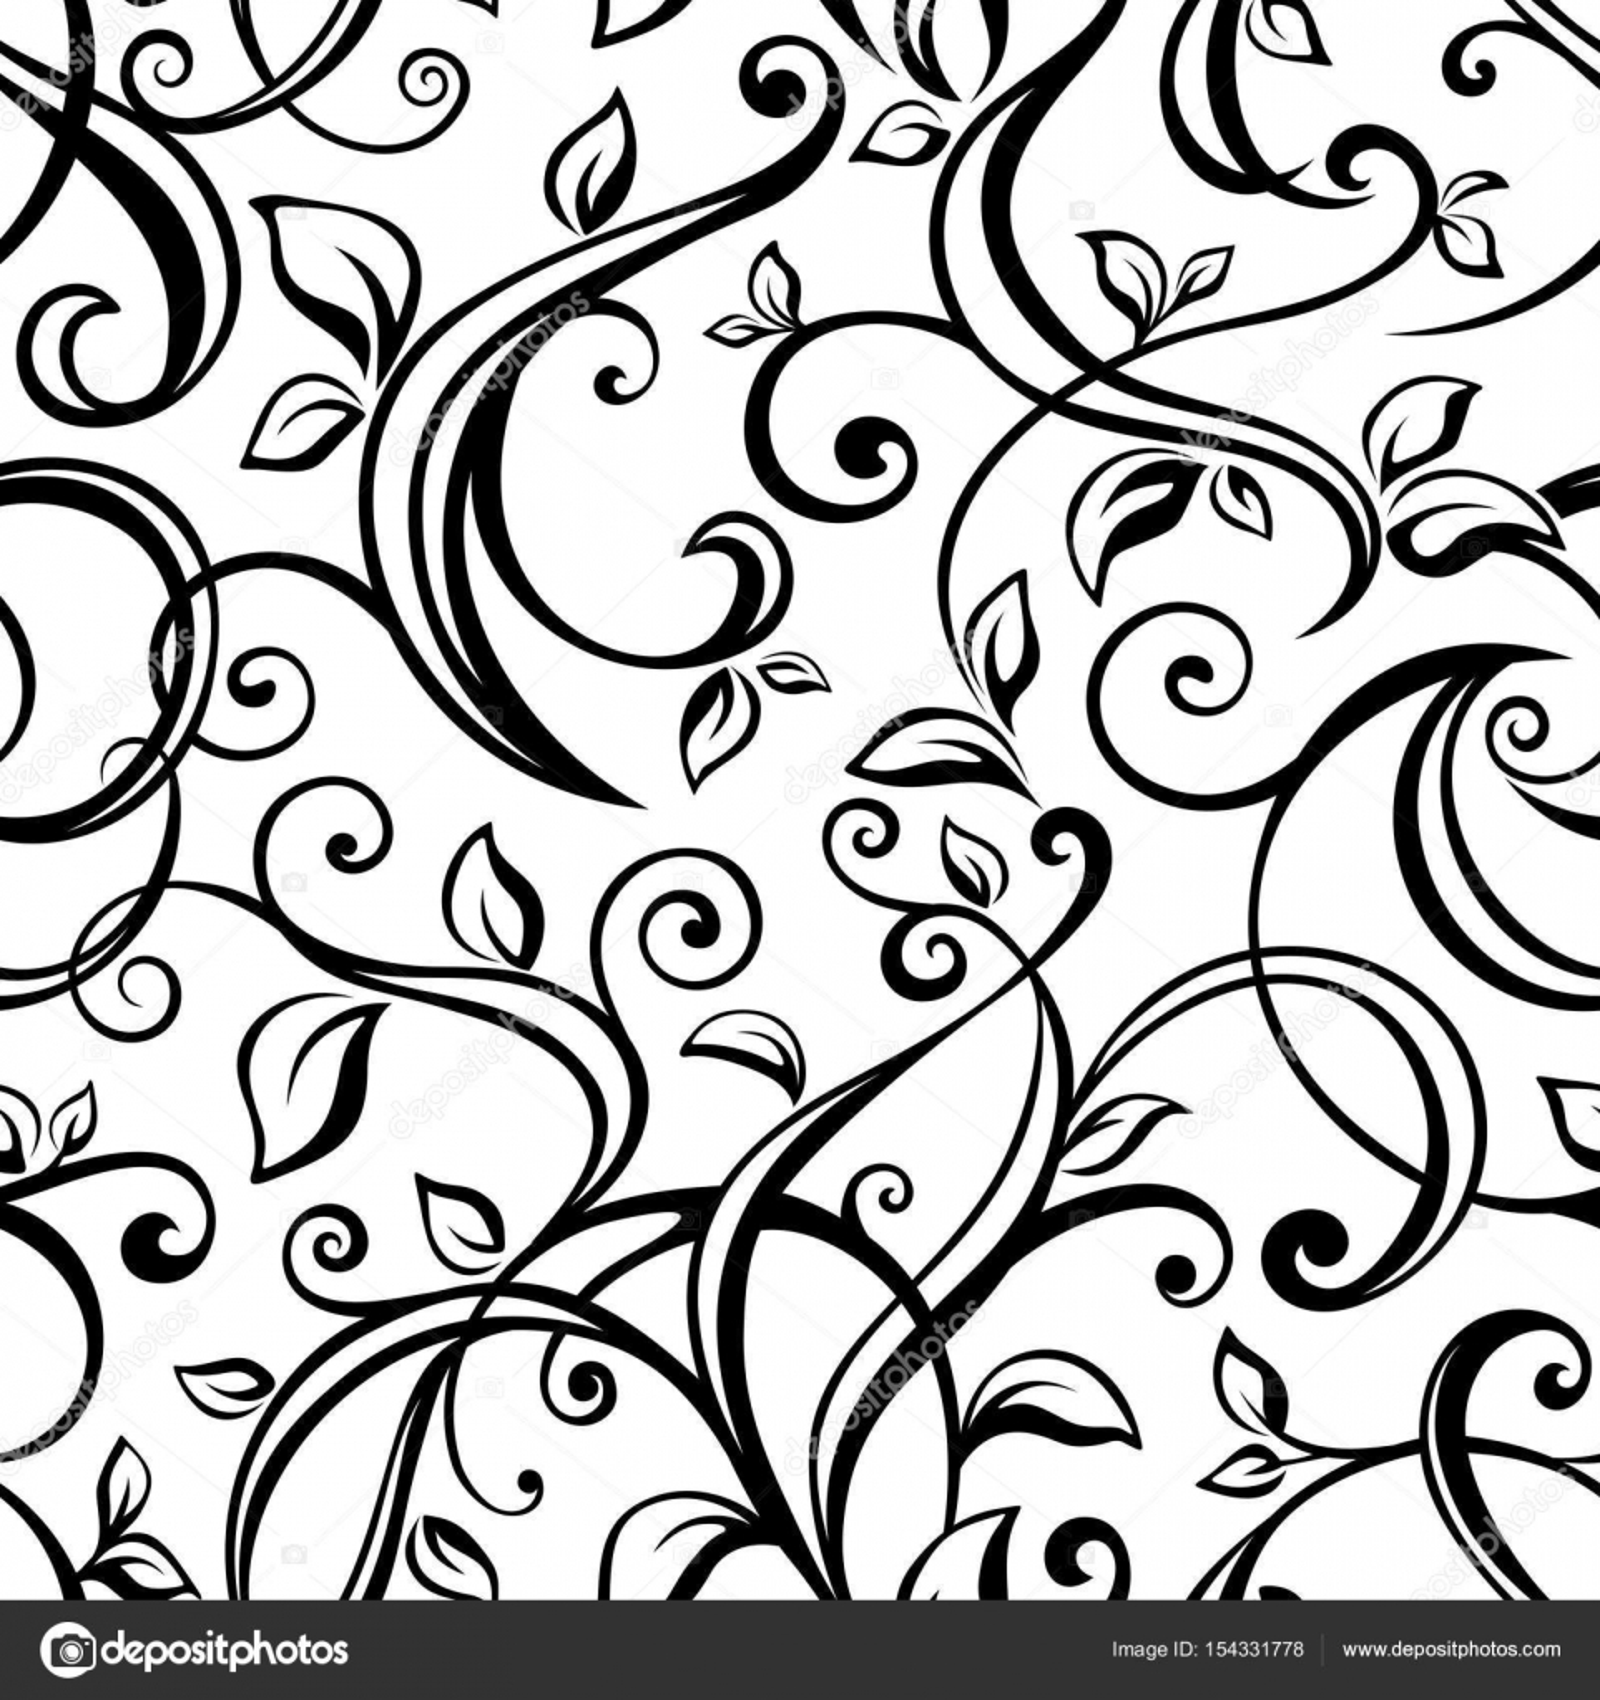 seamless black and white floral pattern vector illustration rh depositphotos com flower pattern vector floral pattern vector design free